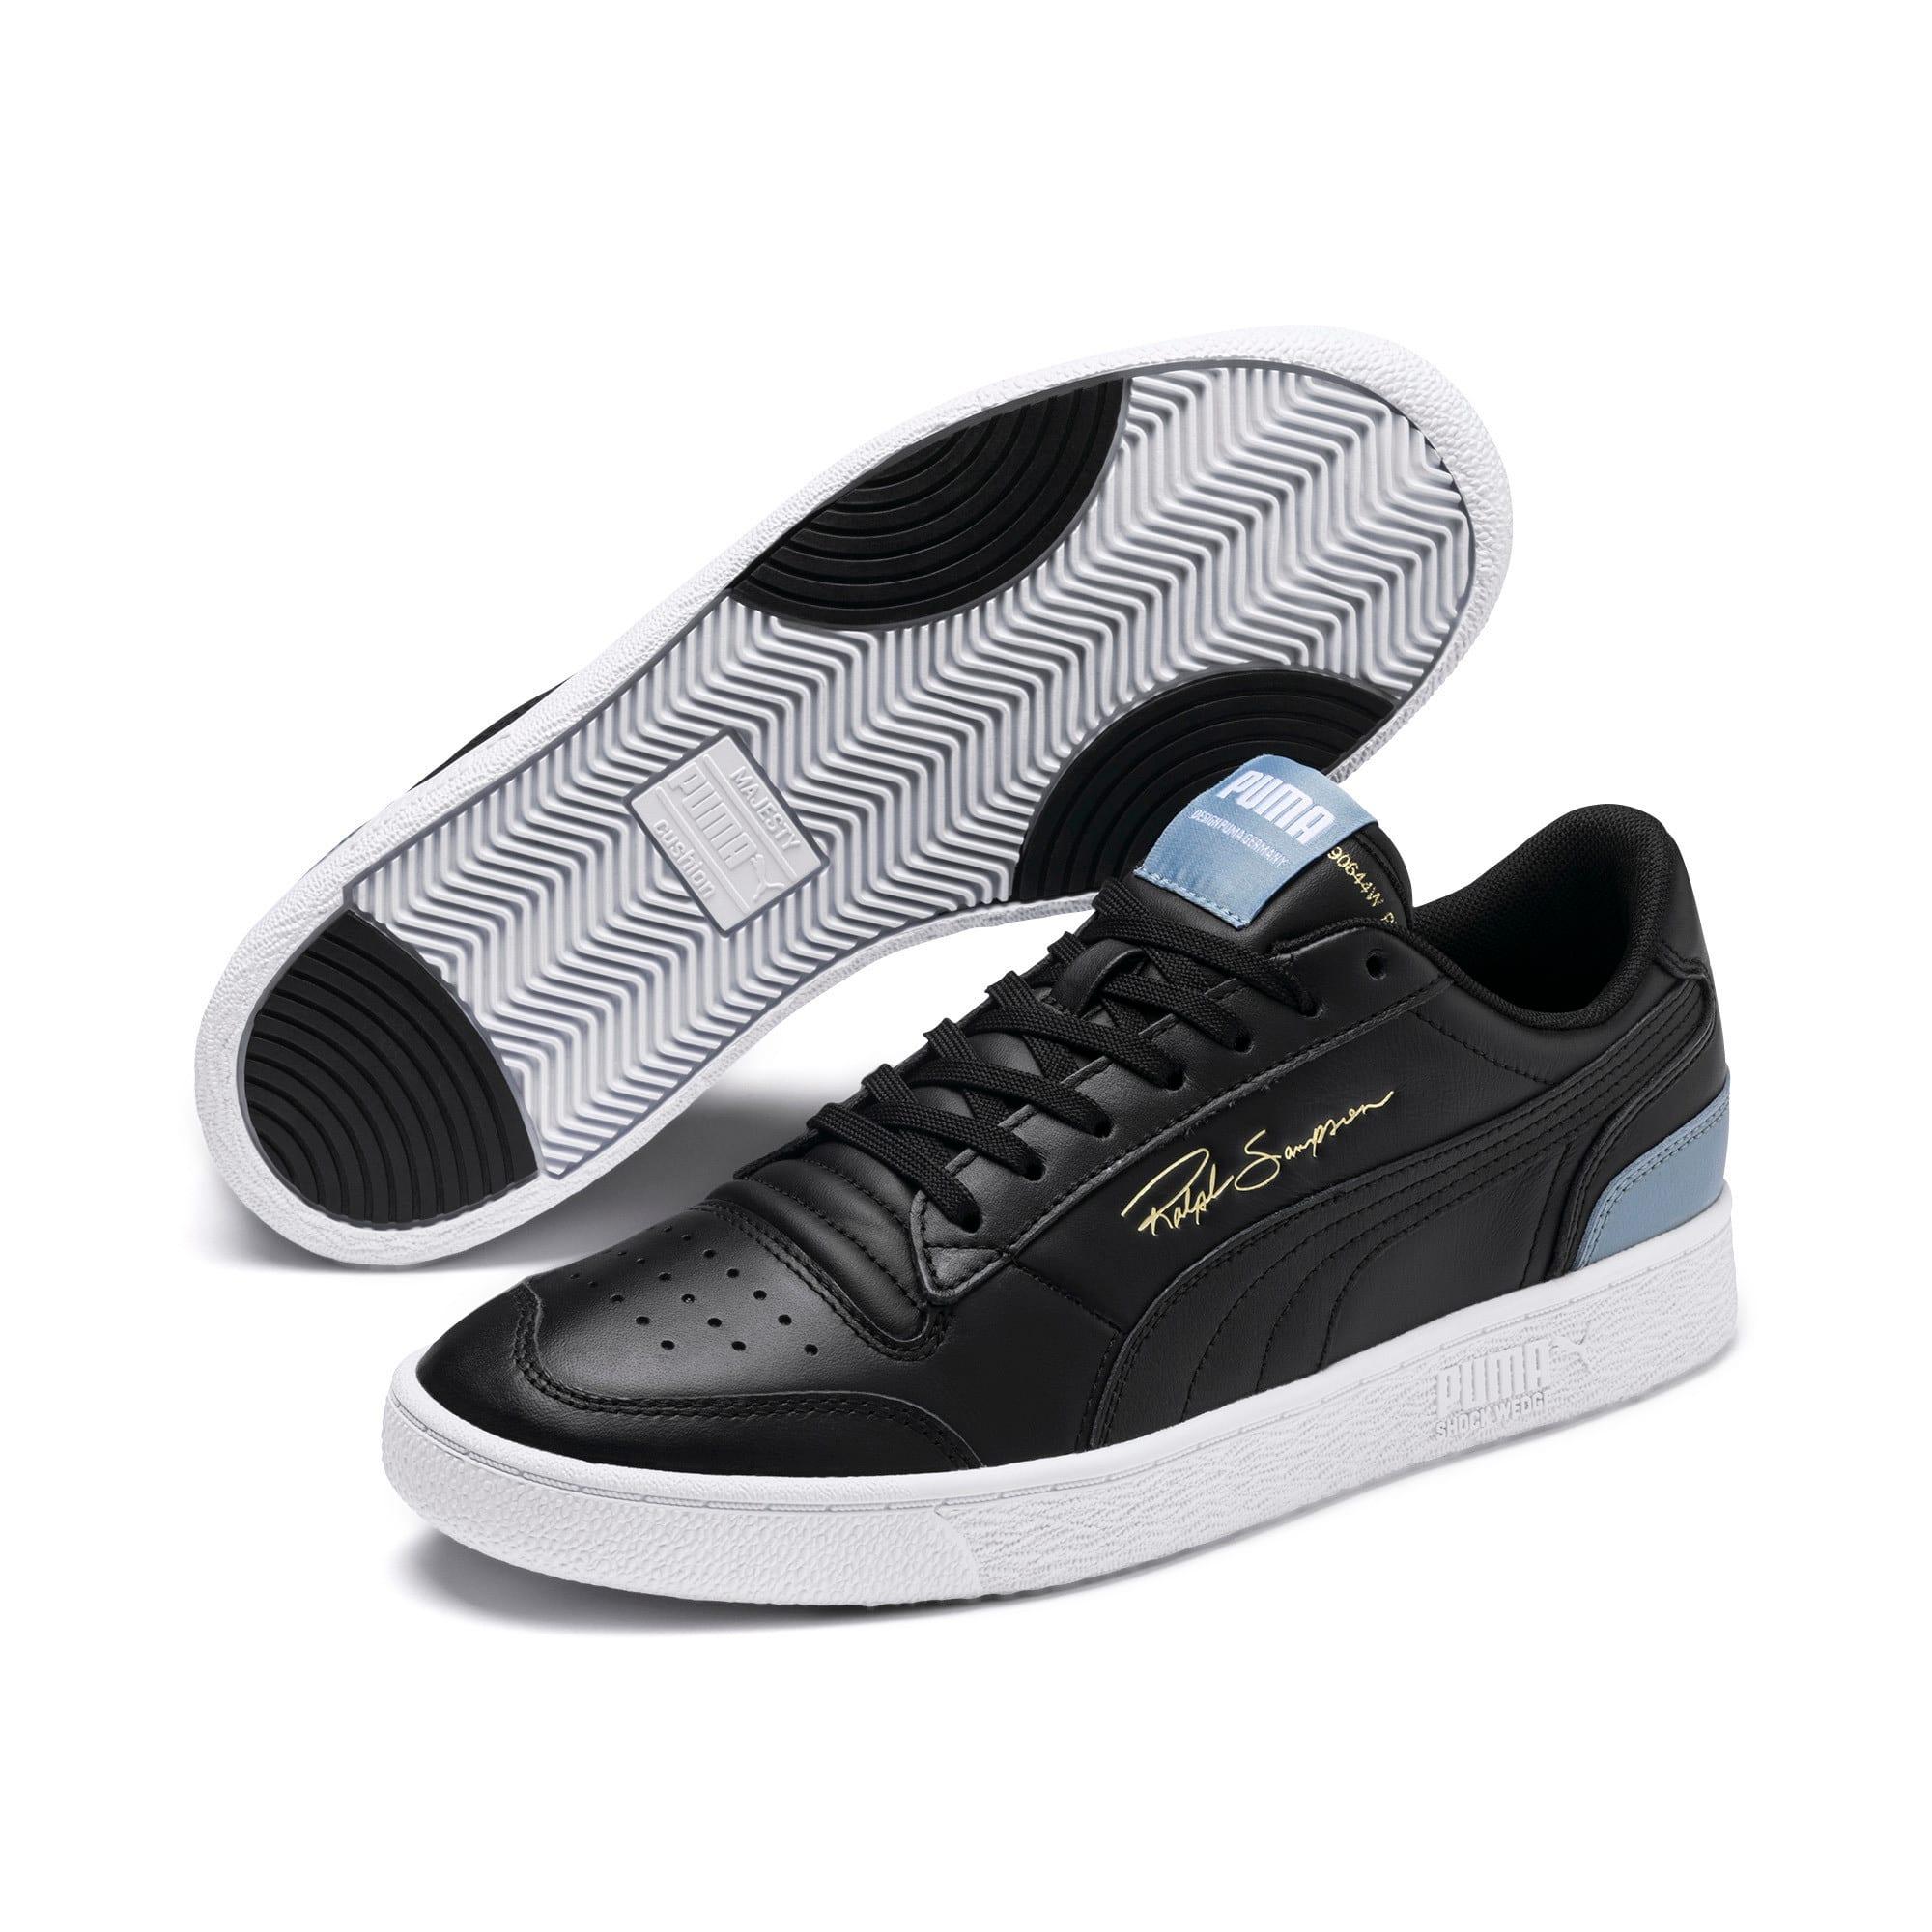 Miniatura 2 de Zapatos deportivosRalph Sampson Lo, Puma Blk-Puma Blk-FadedDenim, mediano